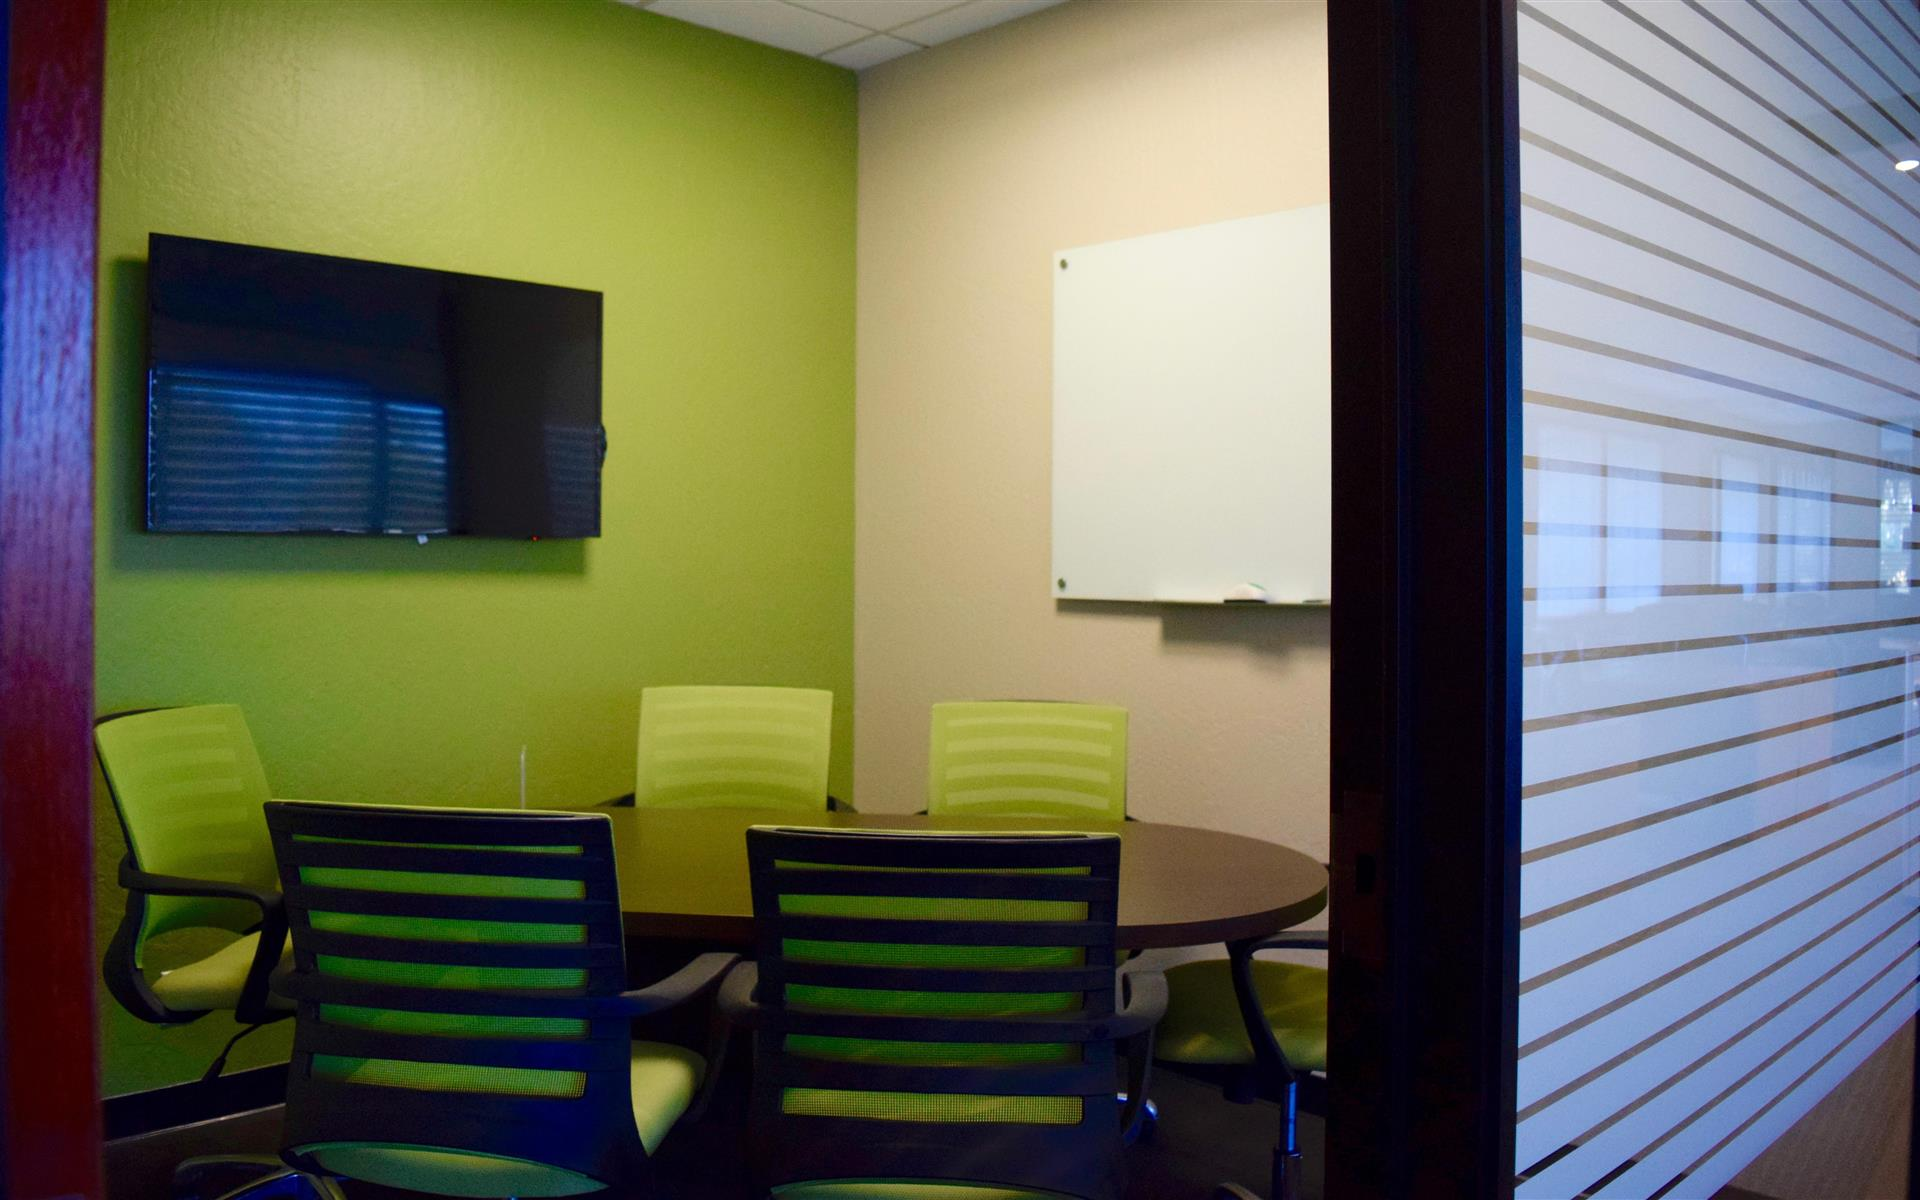 580 Executive Center - Green Room @ Dedicated